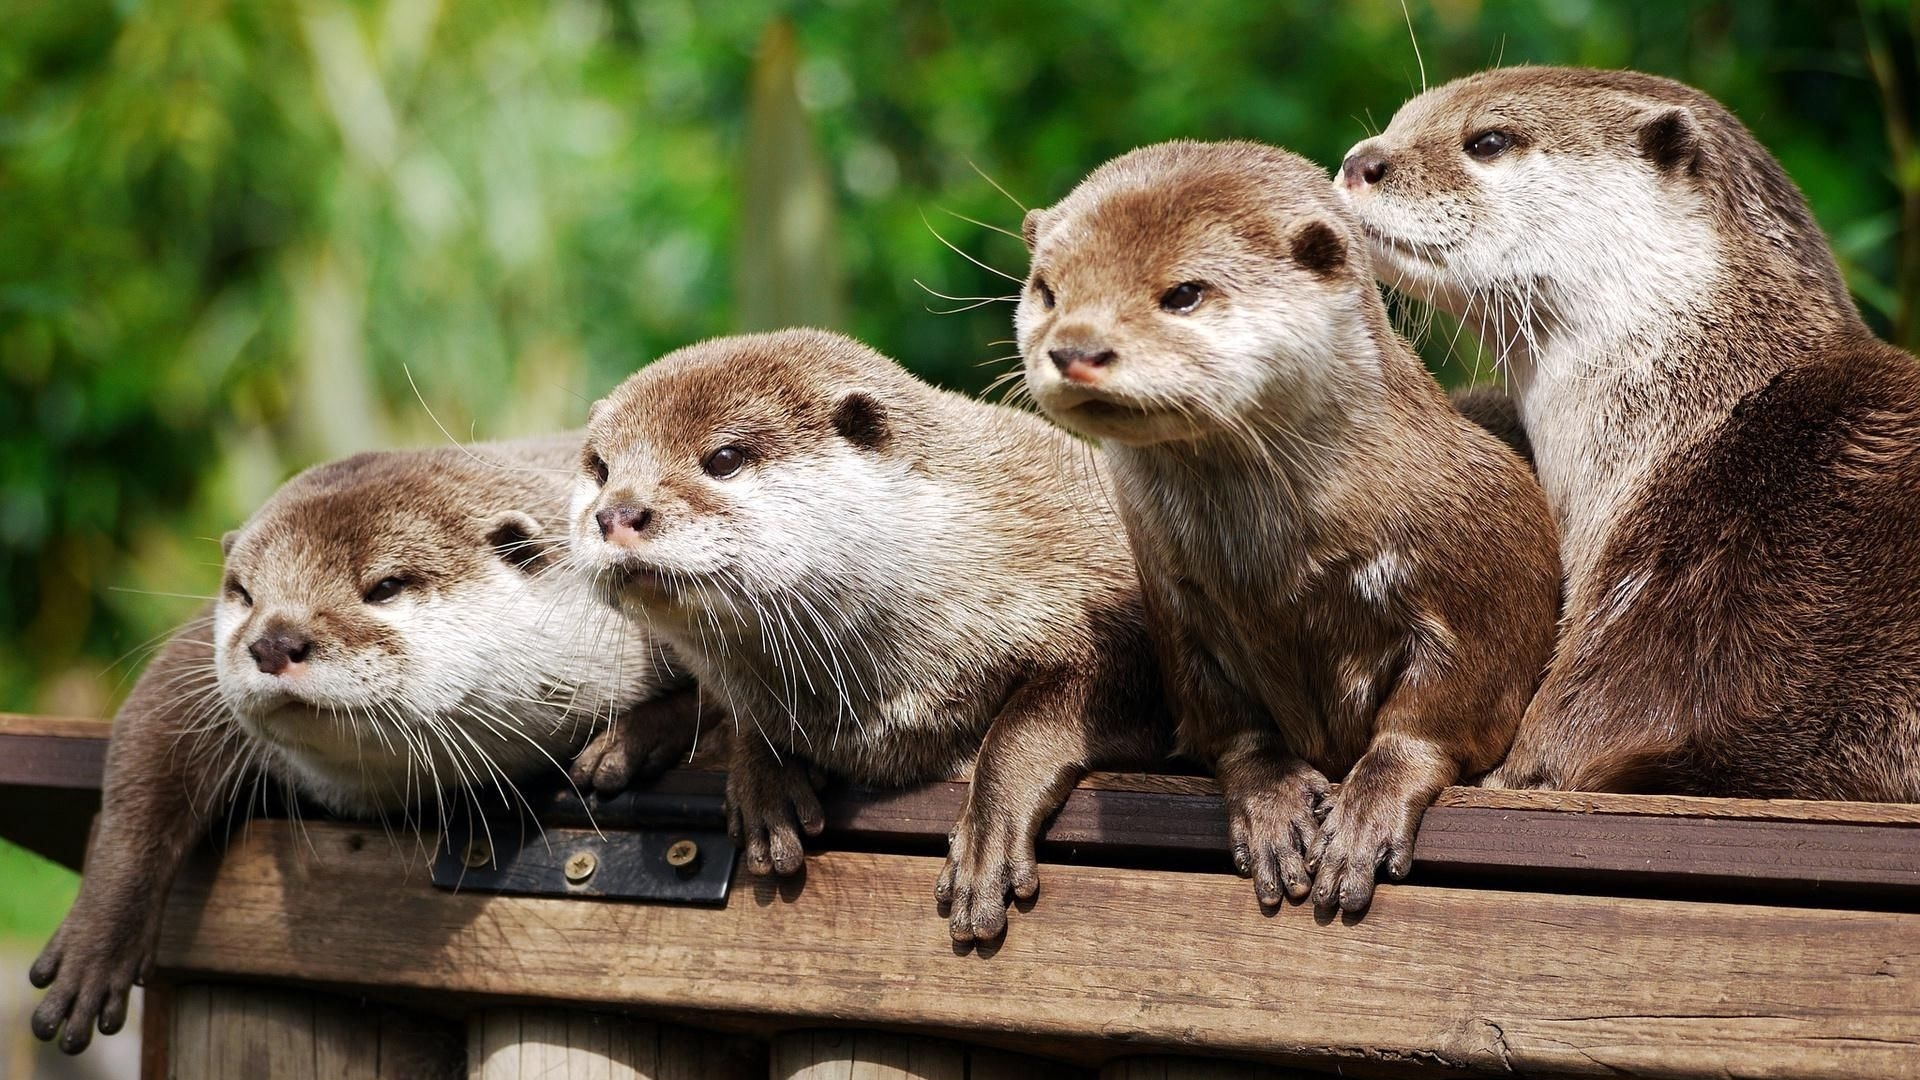 download wallpaper: otters wallpaper